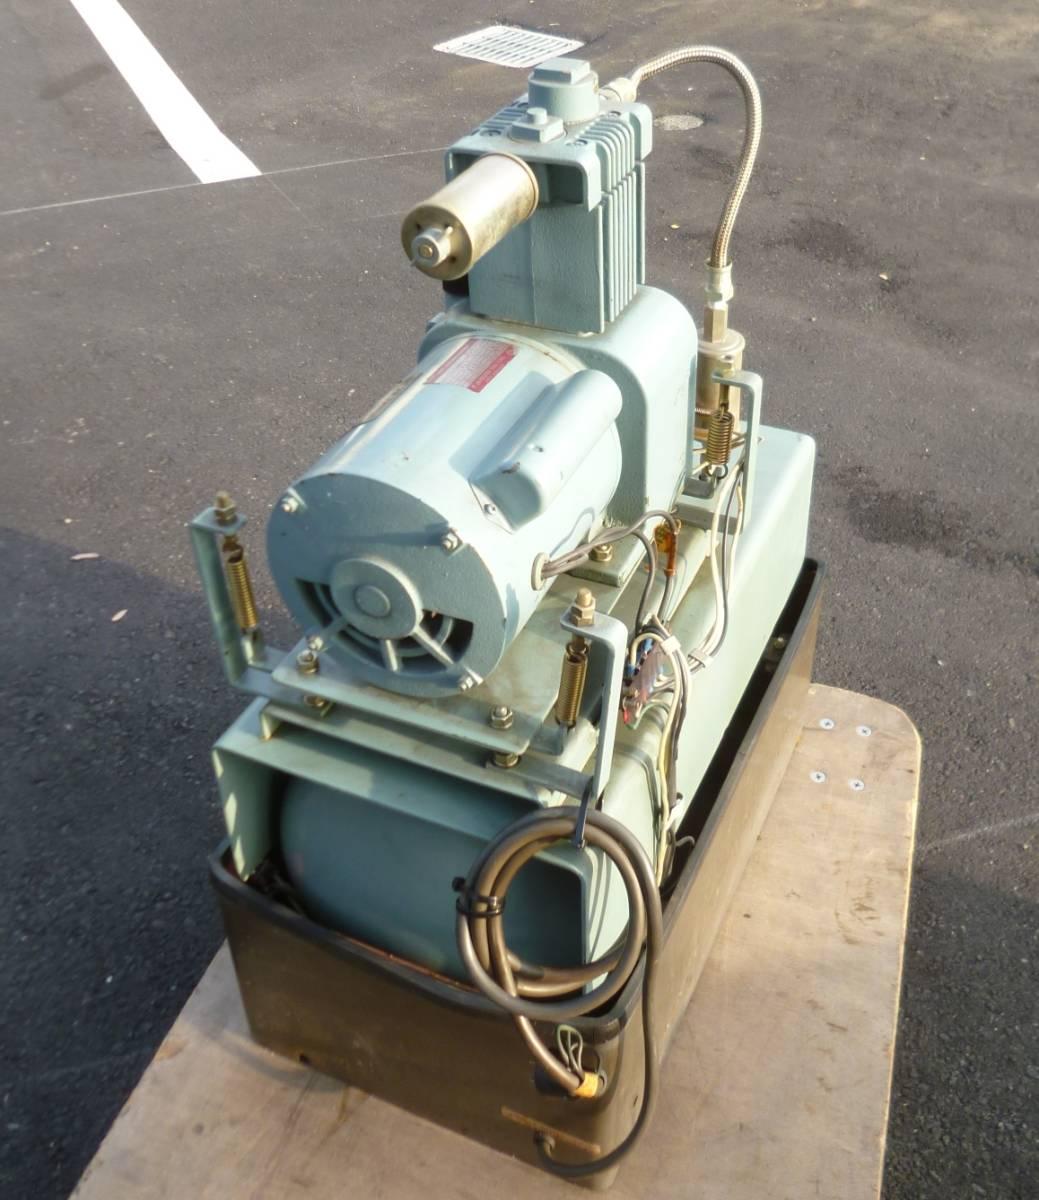 K7096c モリタ 日立 歯科用コンプレッサー A-9 ハイブロウ 100V 60Hz 4.8kg/cm^2_画像3